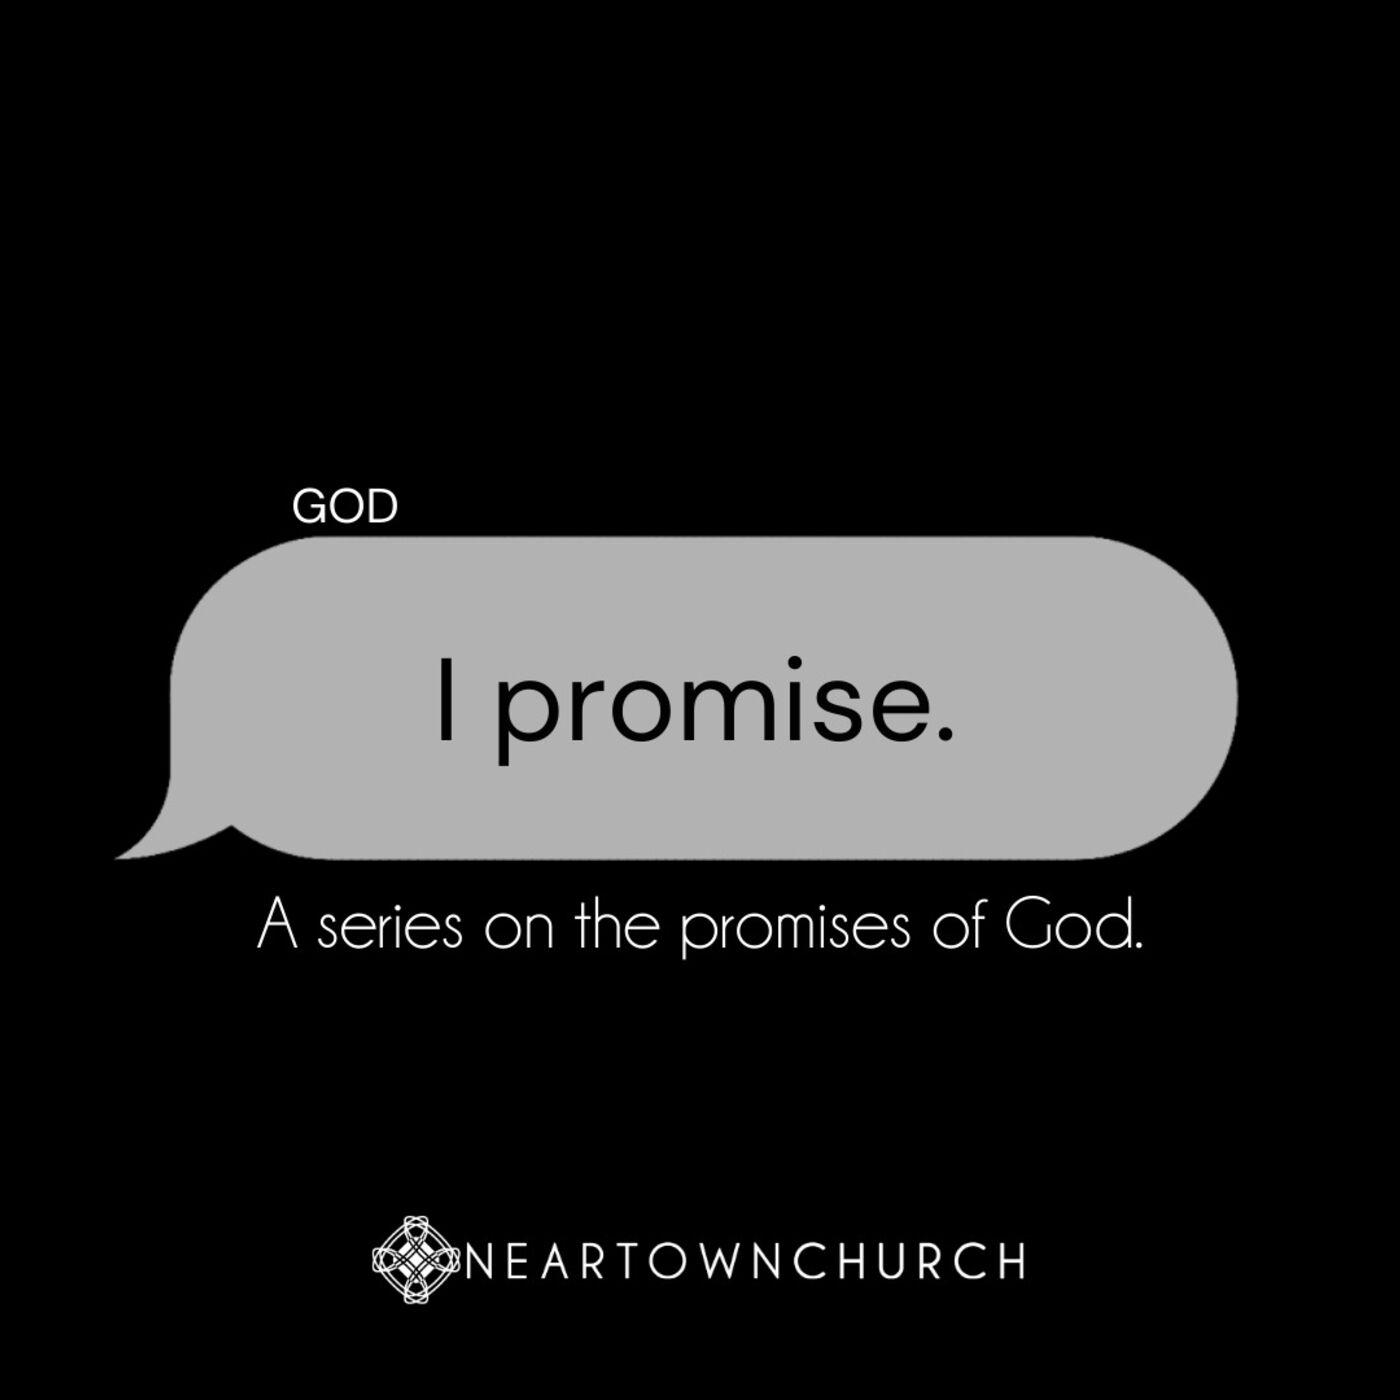 I promise. - 9.27.2020